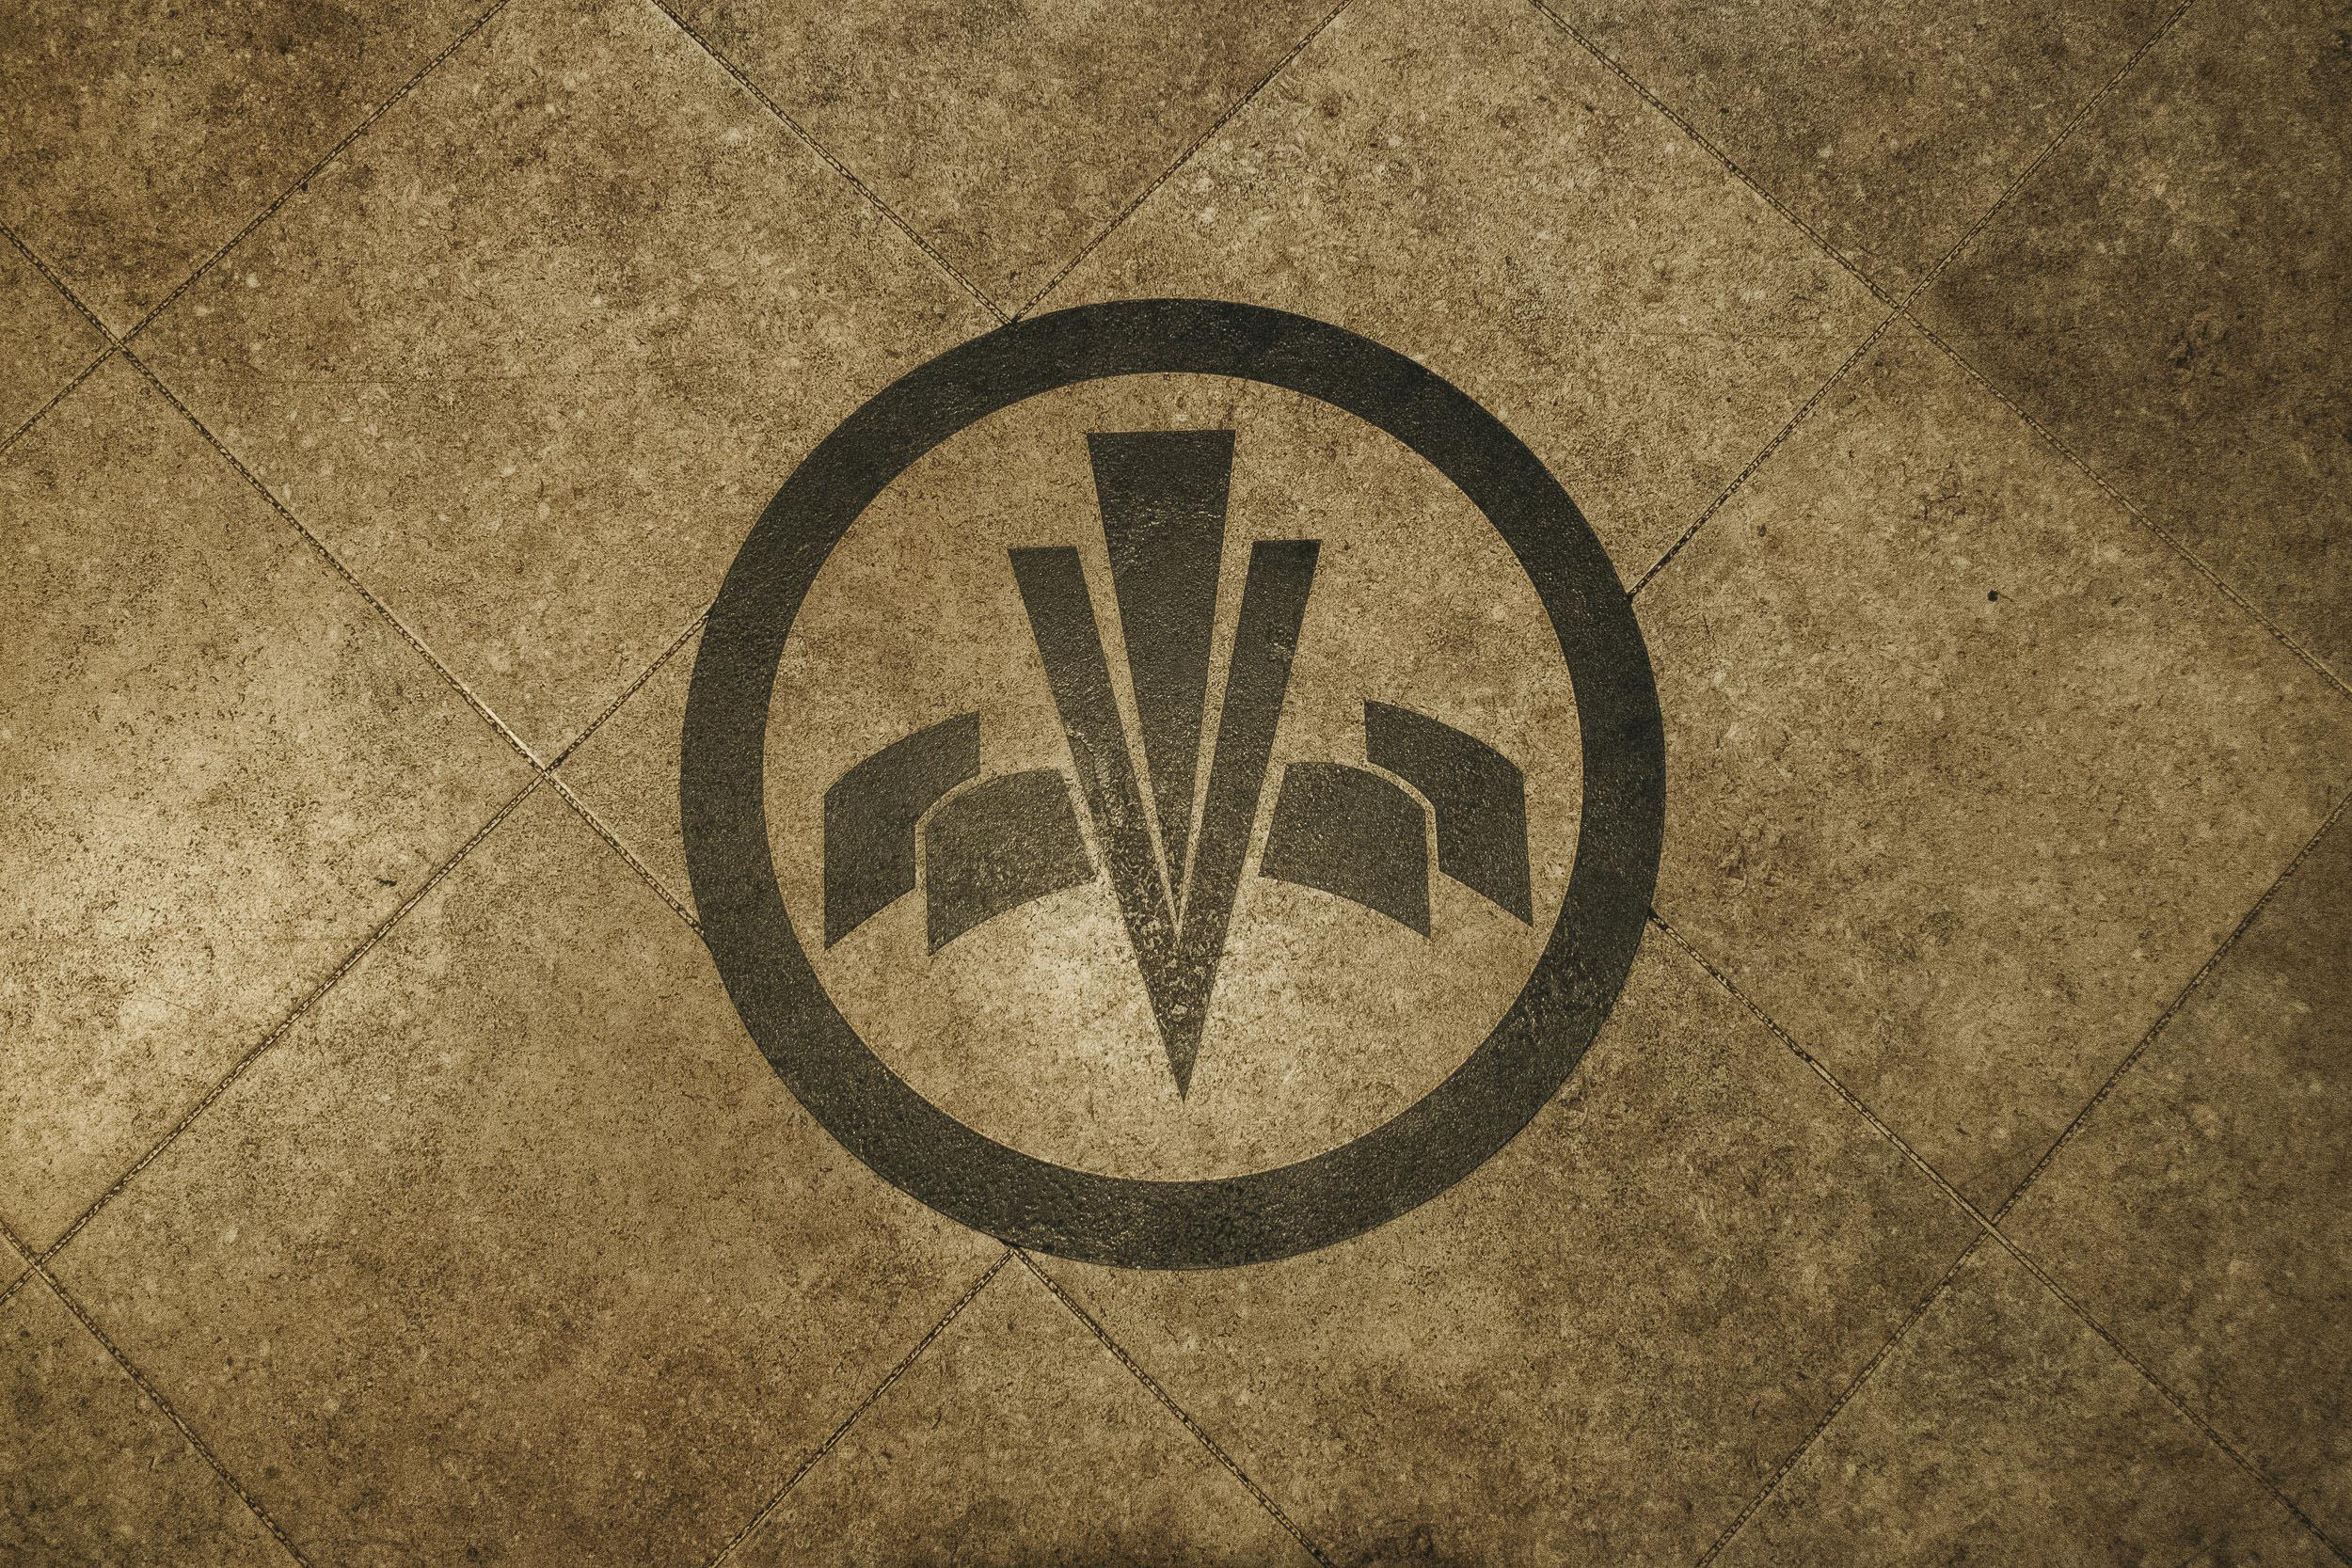 Vermont Hotel logo on marble floor